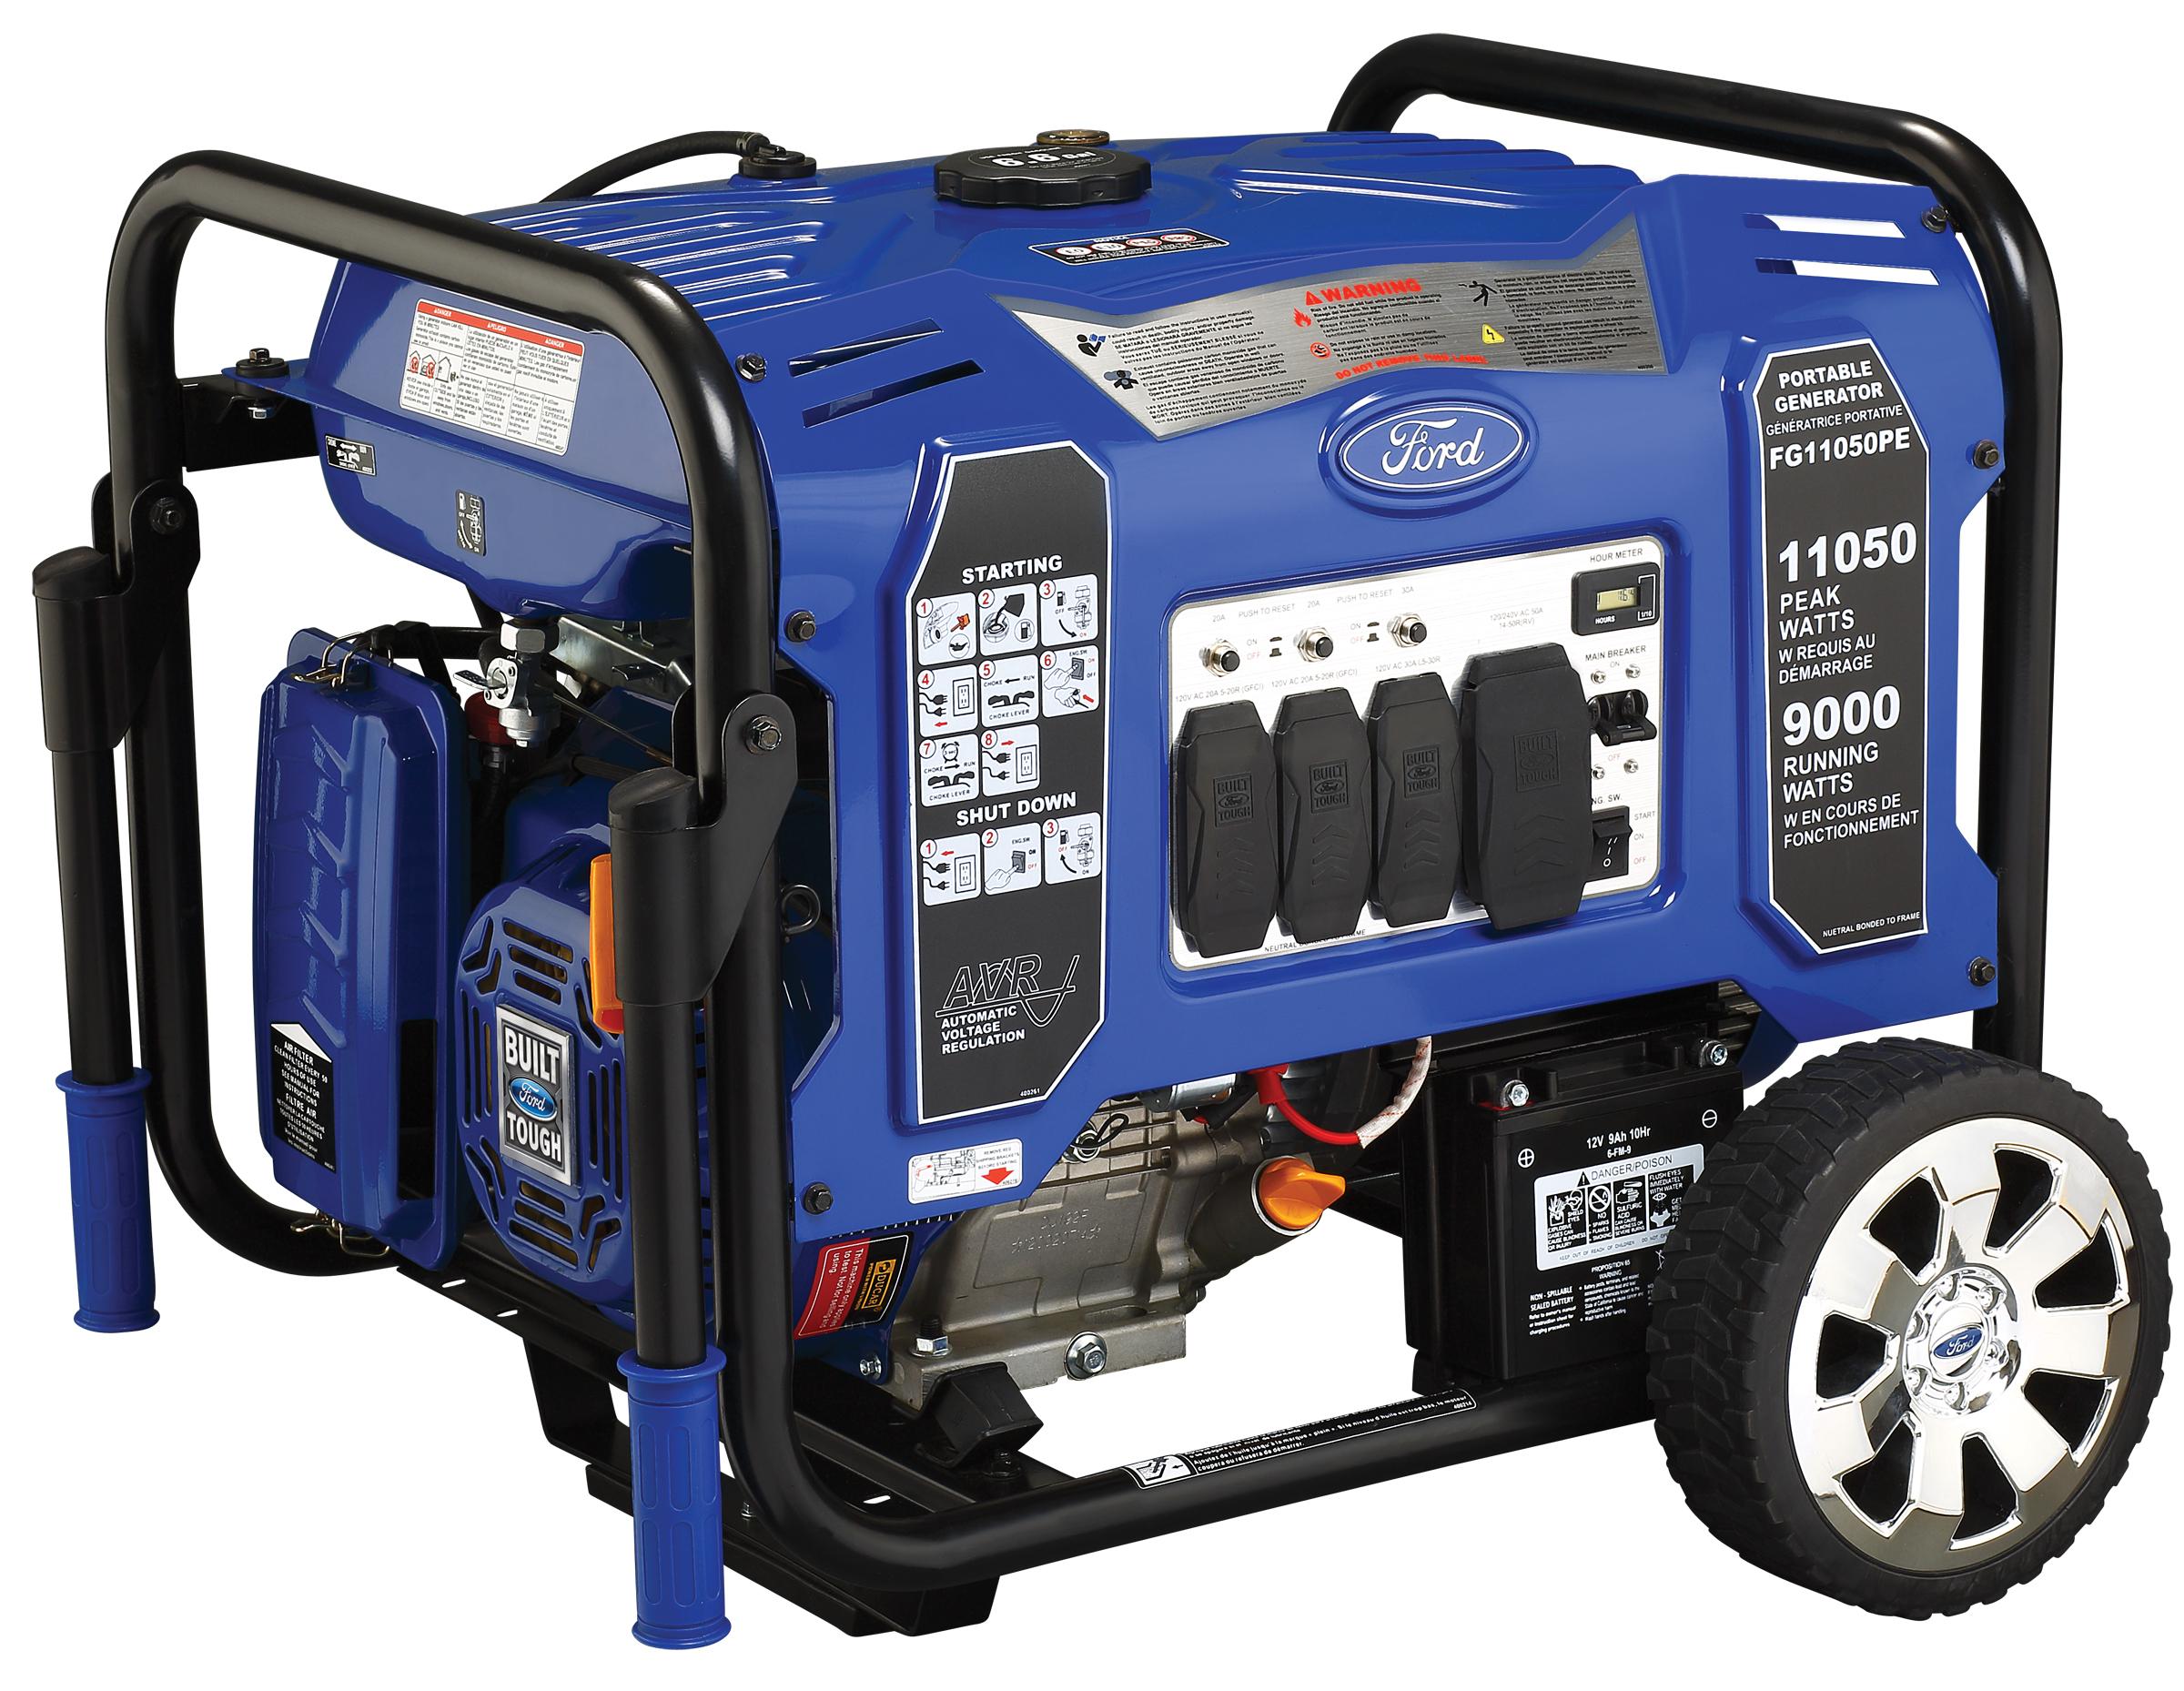 Ford M-Series 11050 Watt Gasoline Portable Generator